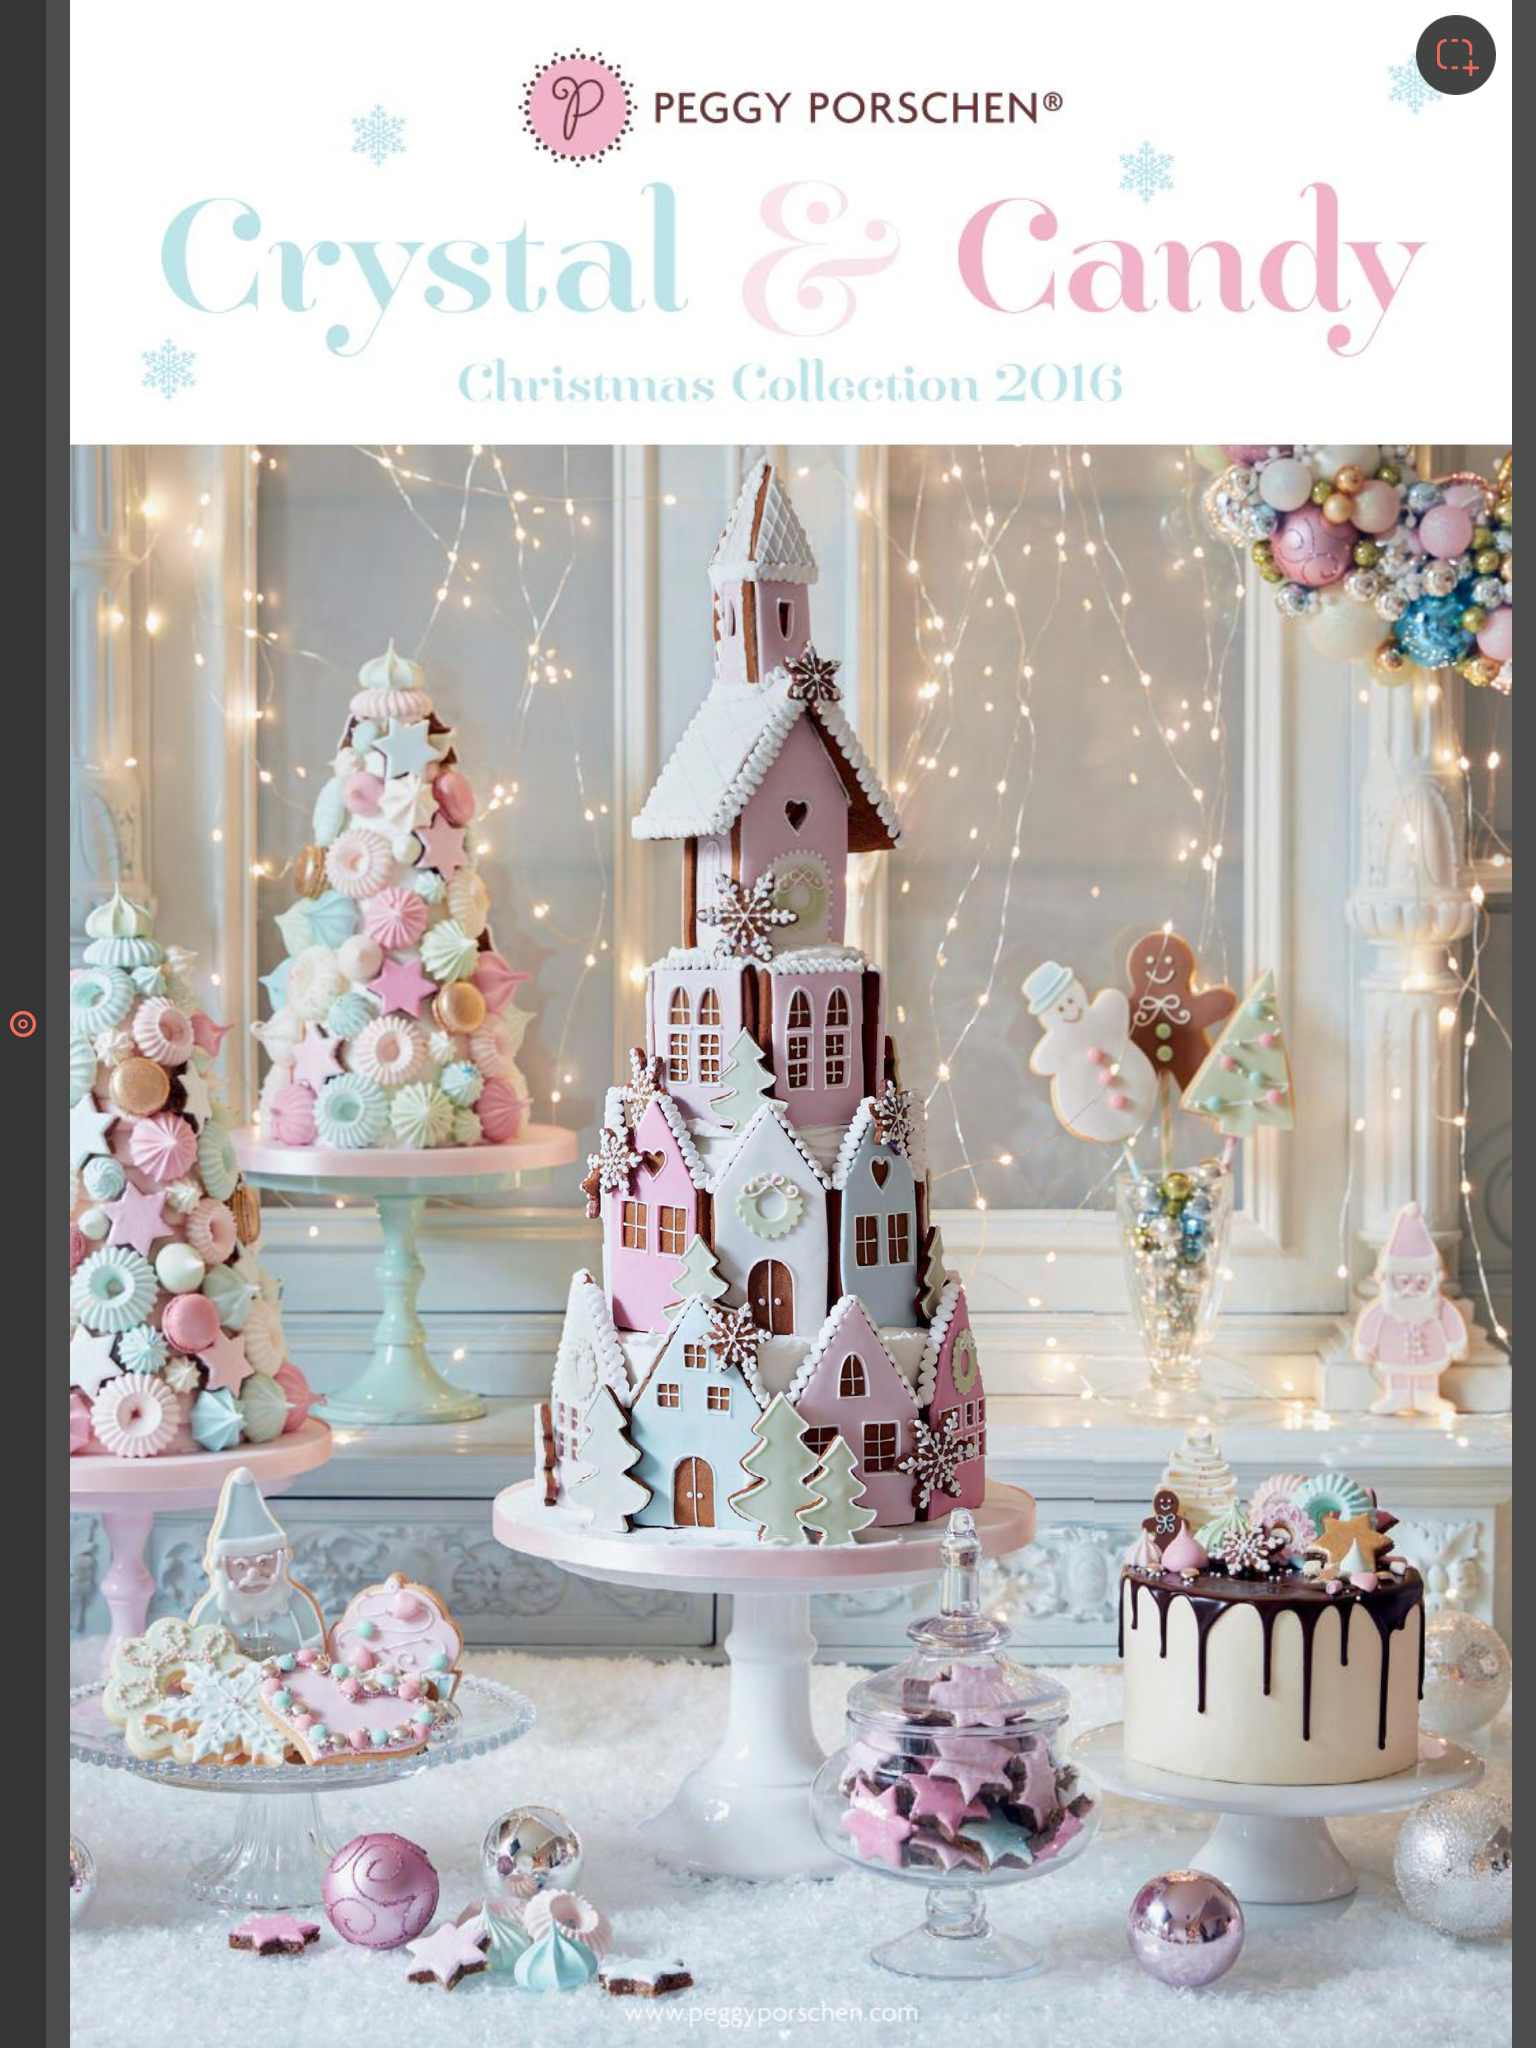 Pin by Roxy Callejo on Making Fabulous Cakes****** | Christmas cake, Xmas cake, Holiday cakes